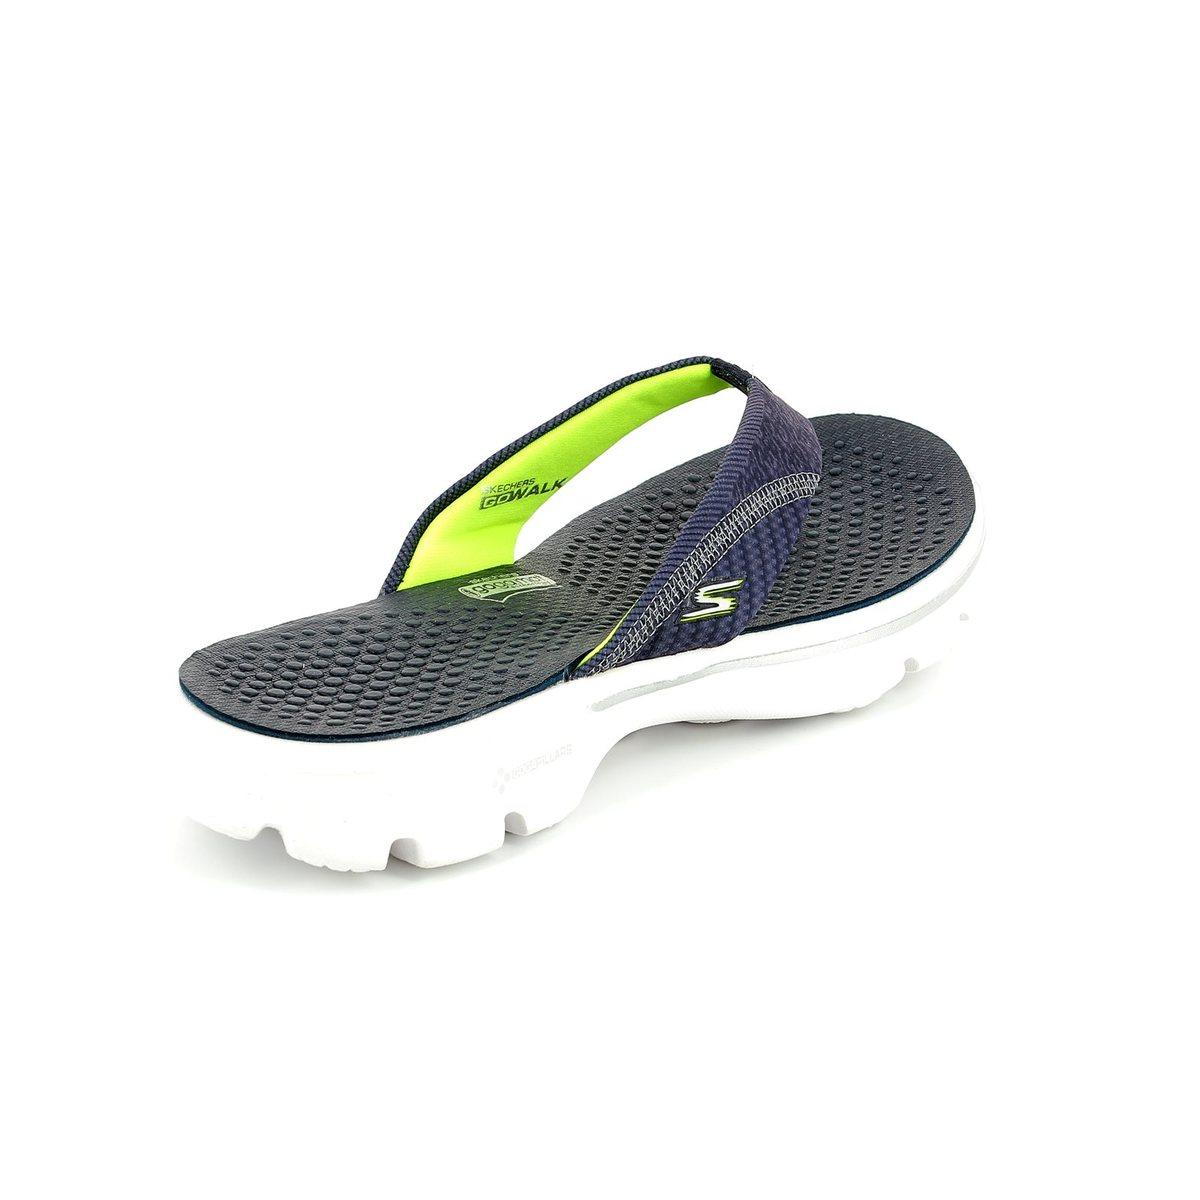 Skechers Pizazz Go Walk 14250 NVY Navy sandals